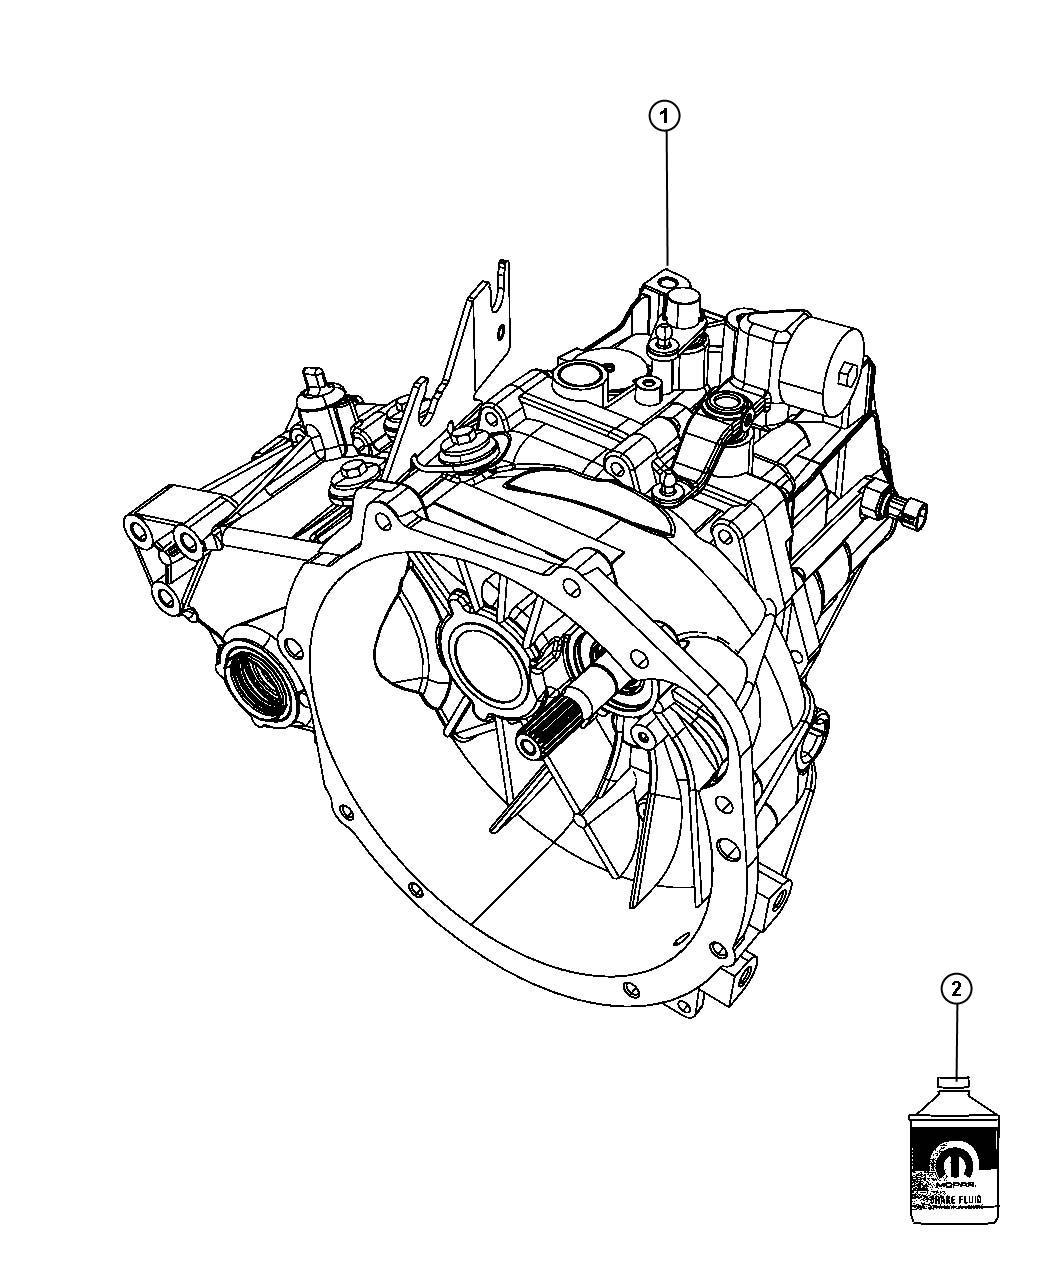 Jeep Compass Transaxle, transmission. 5 speed. Module